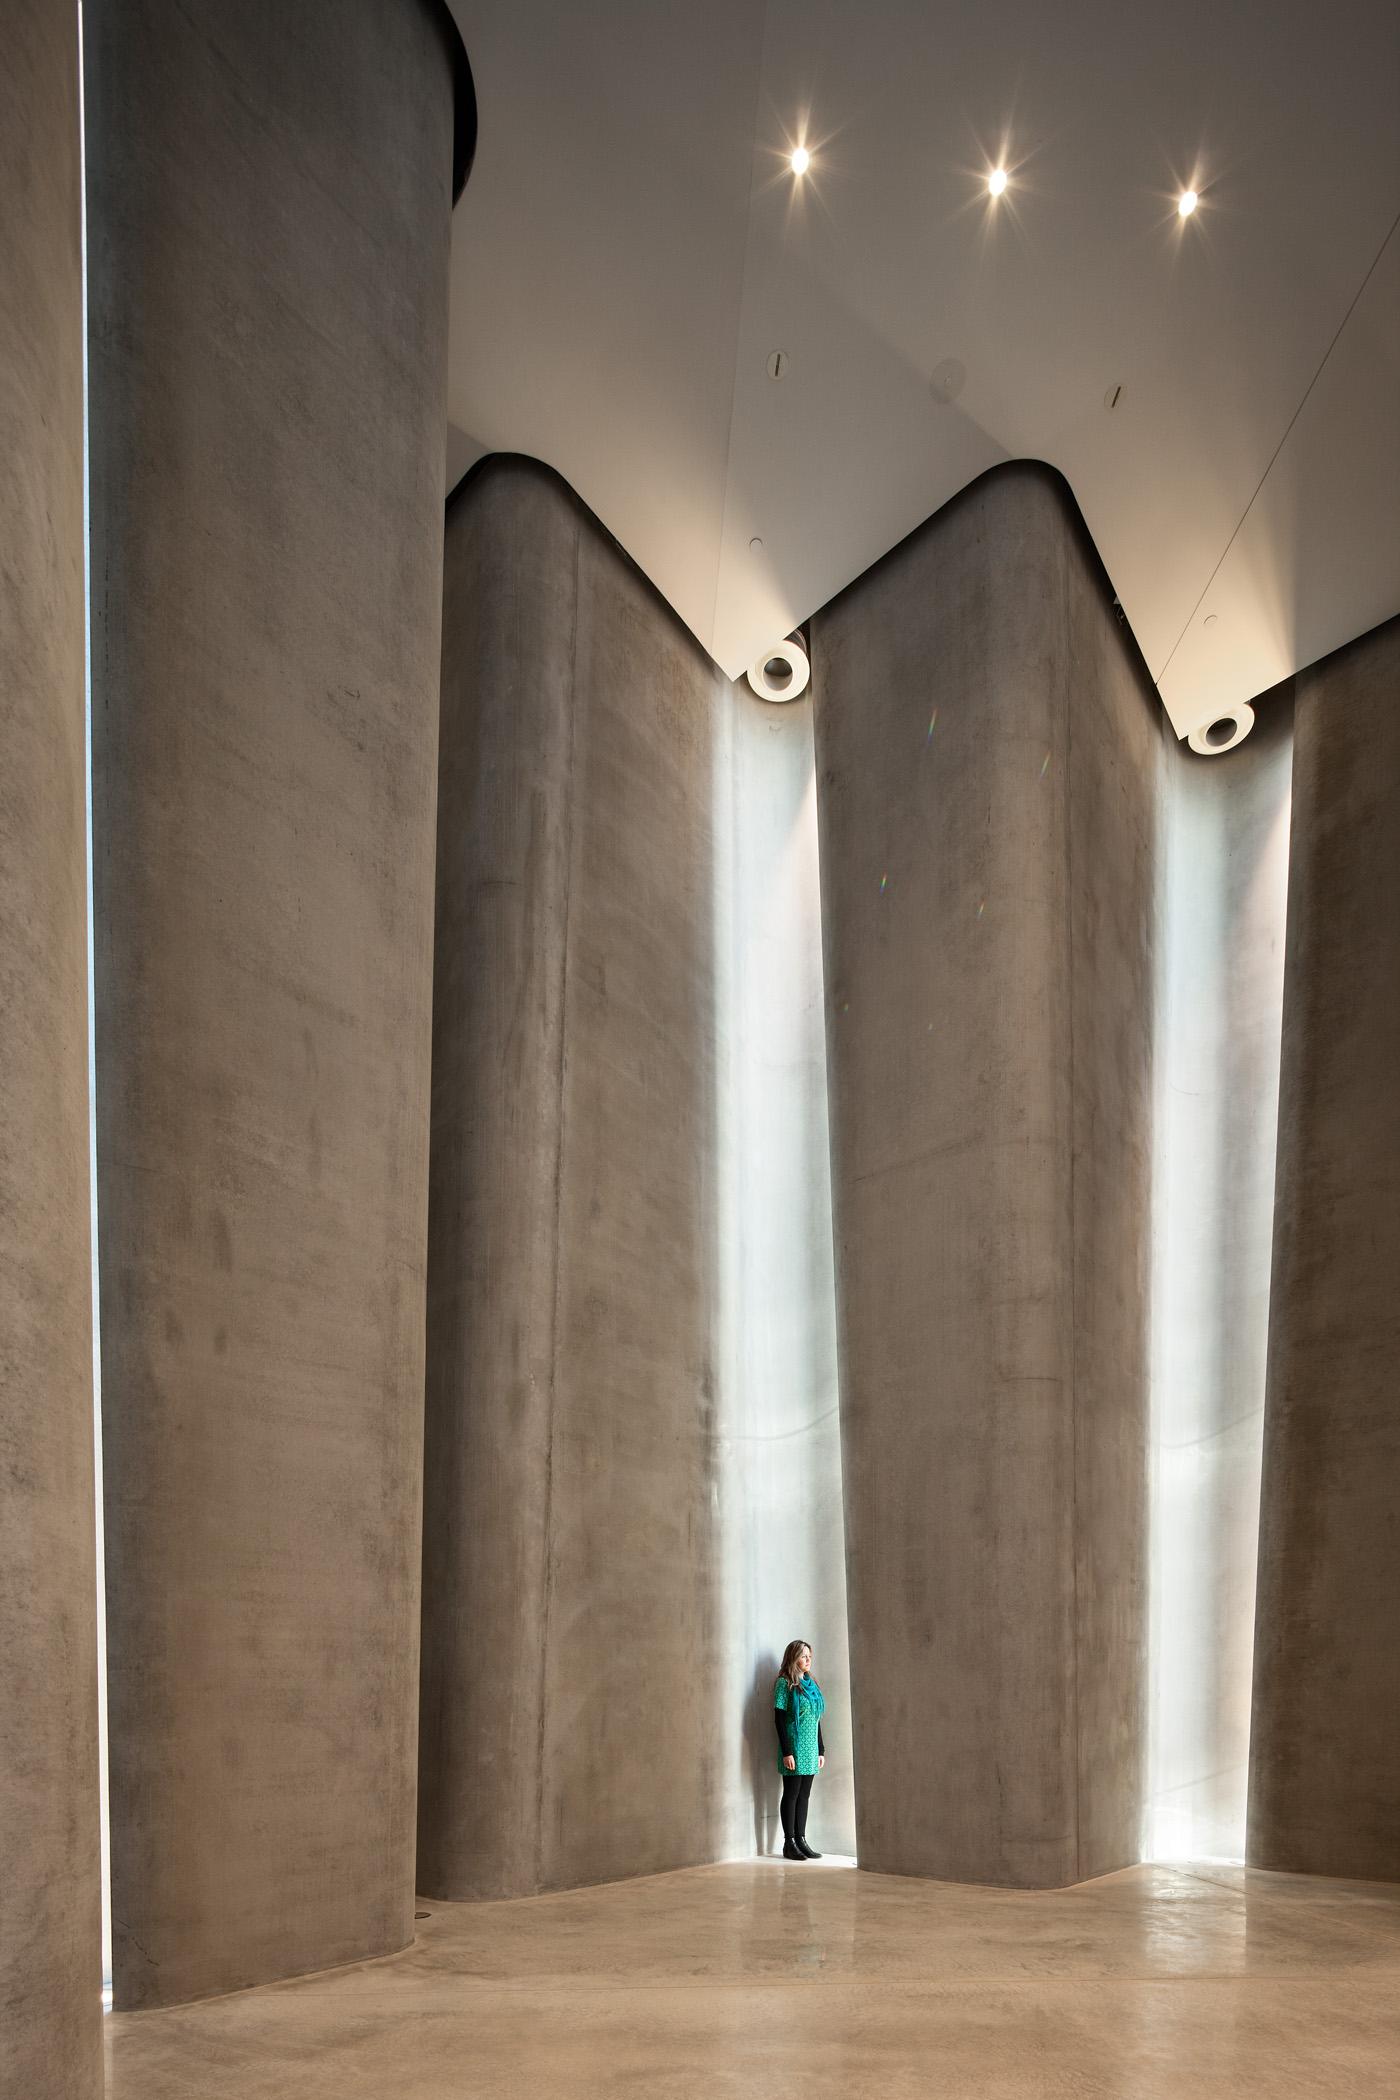 Govett-Brewer Gallery & Len Lye Centre